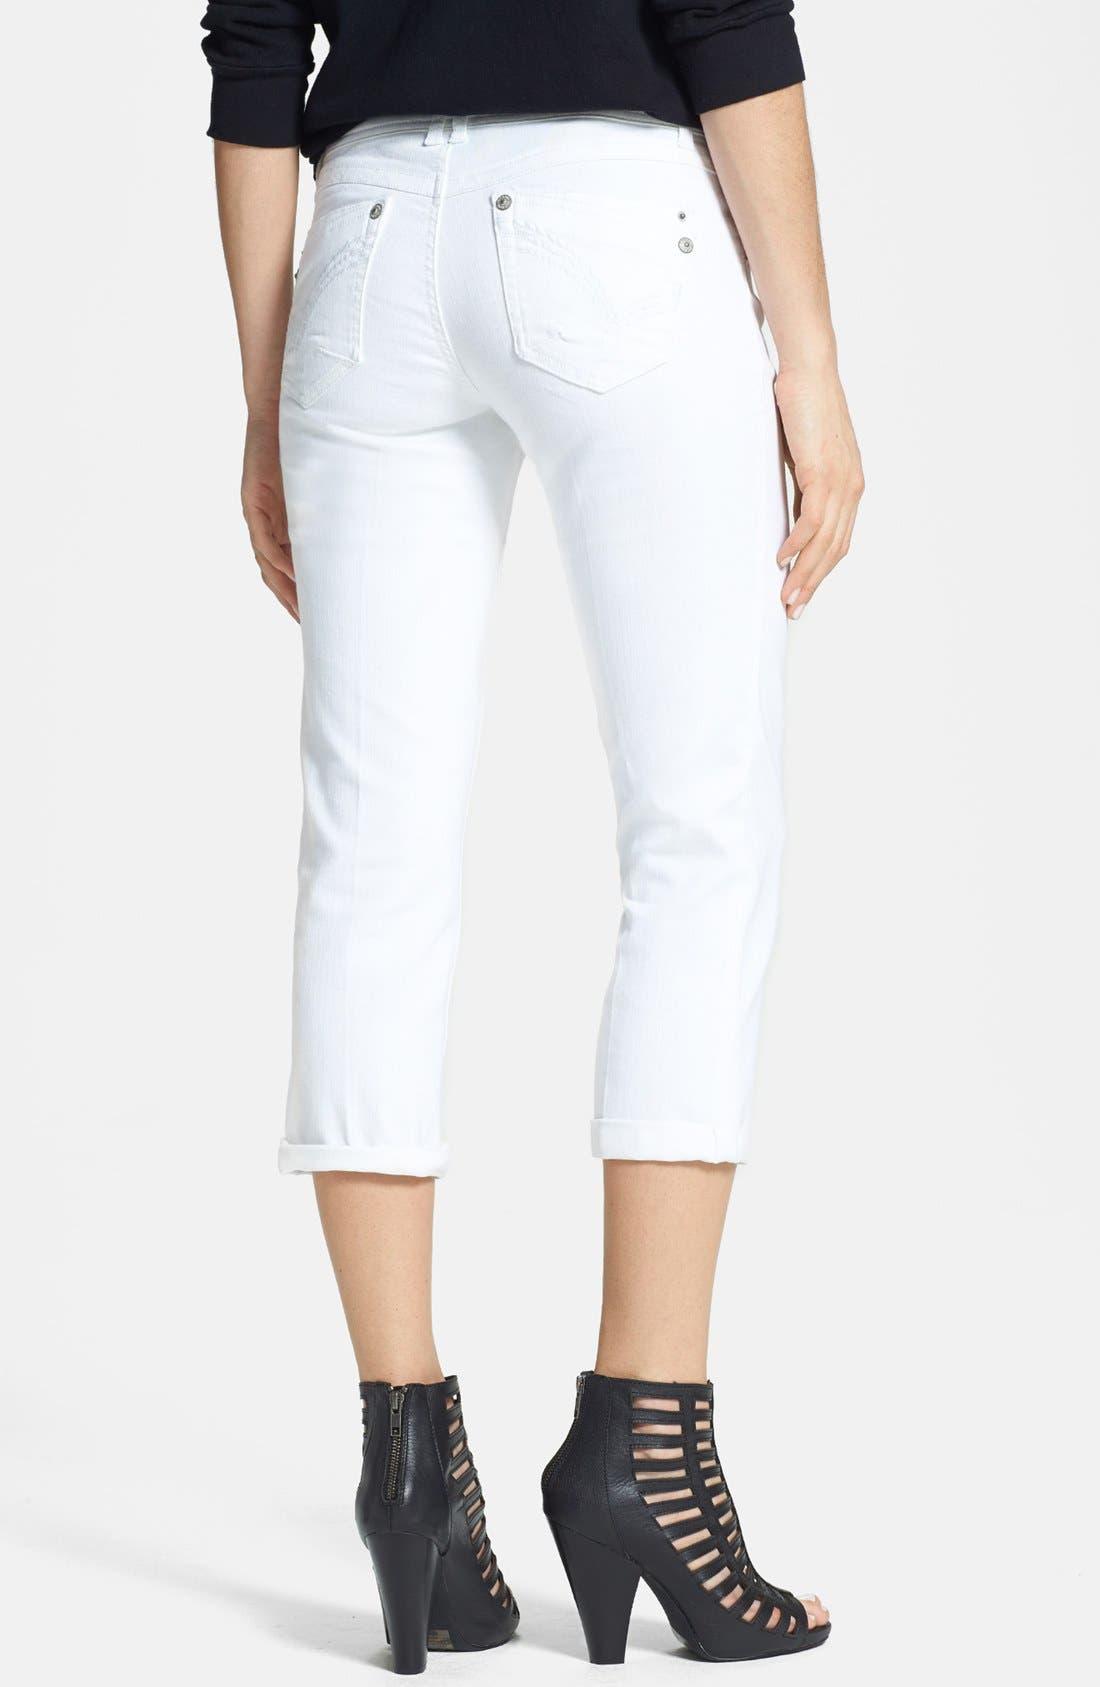 Alternate Image 2  - Jolt Crop Jeans (White) (Juniors) (Online Only)